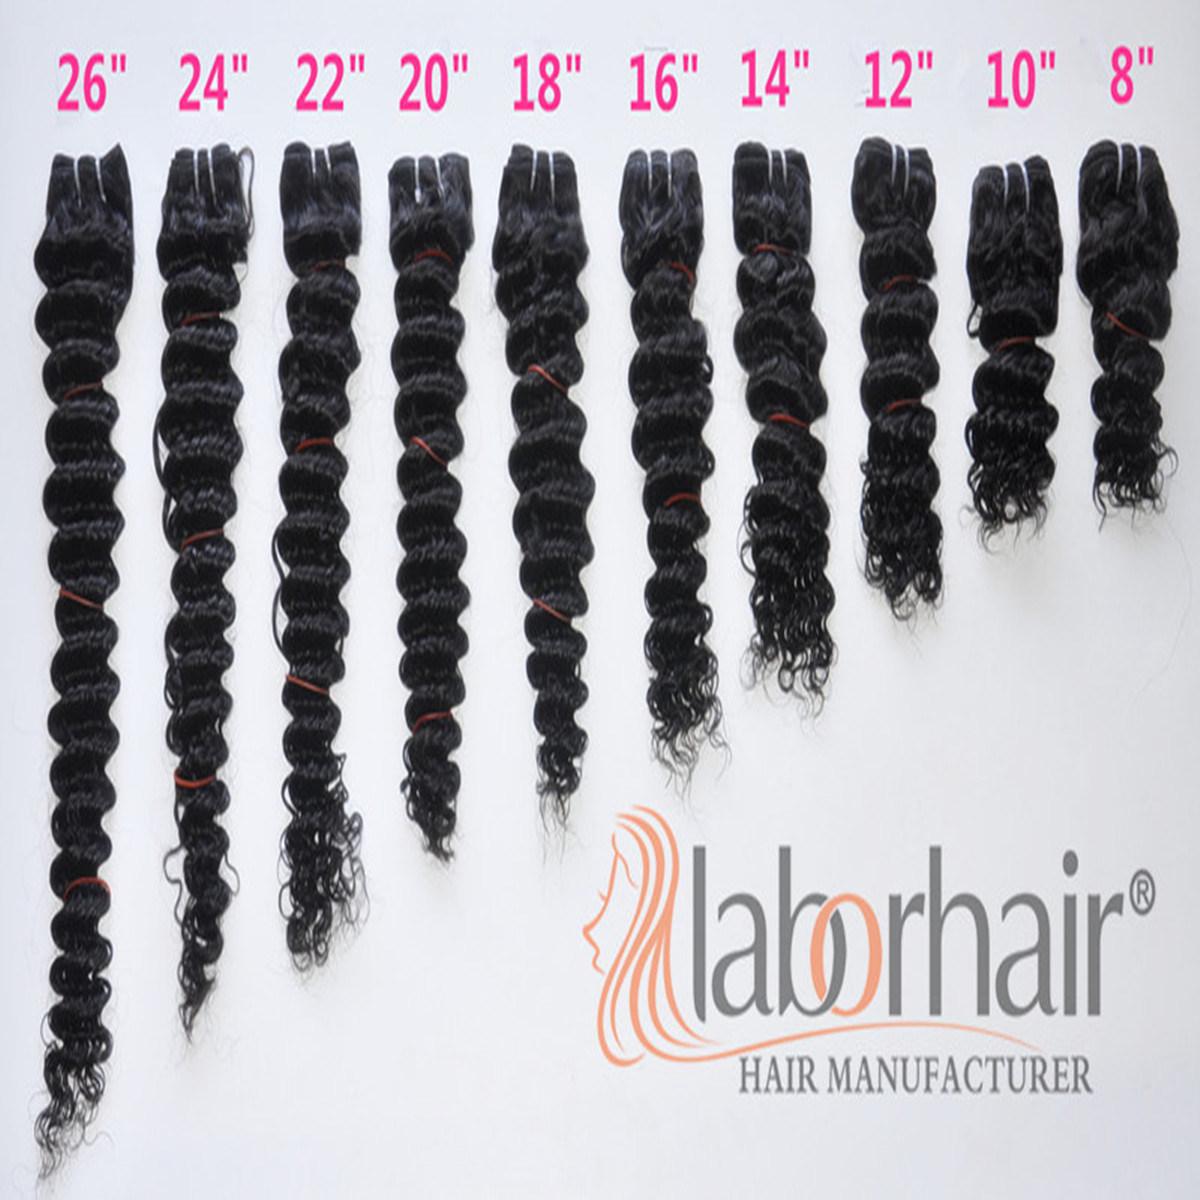 9A Labor Hair Products Brazilian Hair Weave Bundles Deep Curly Virgin Hair 105g, Top Human Hair Extension Bundles